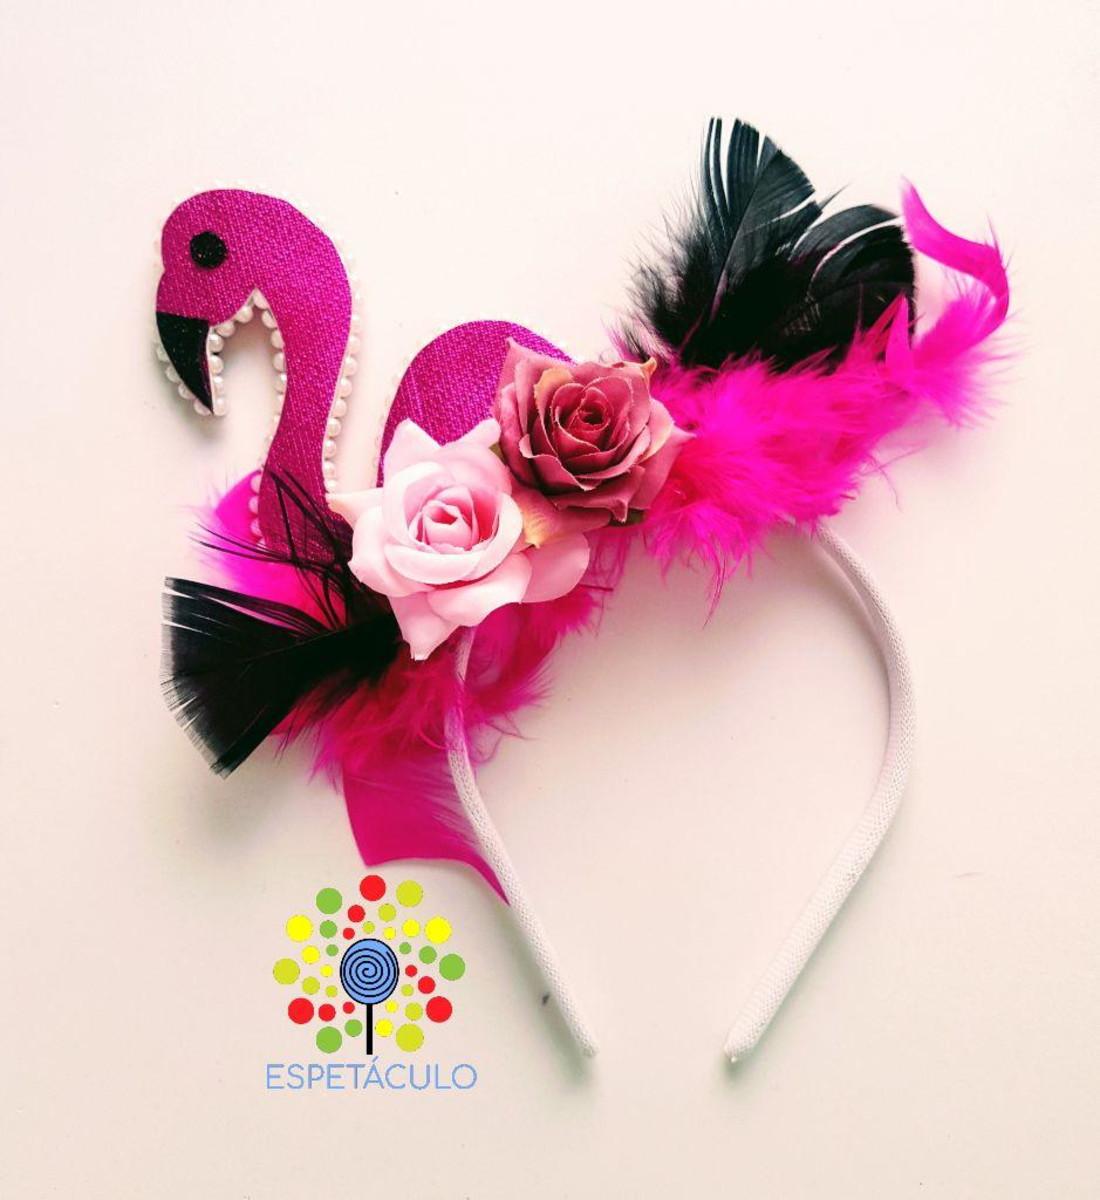 Tiara Flamingo Luxo No Elo7 Espetaculo Fantasias Bf04dc